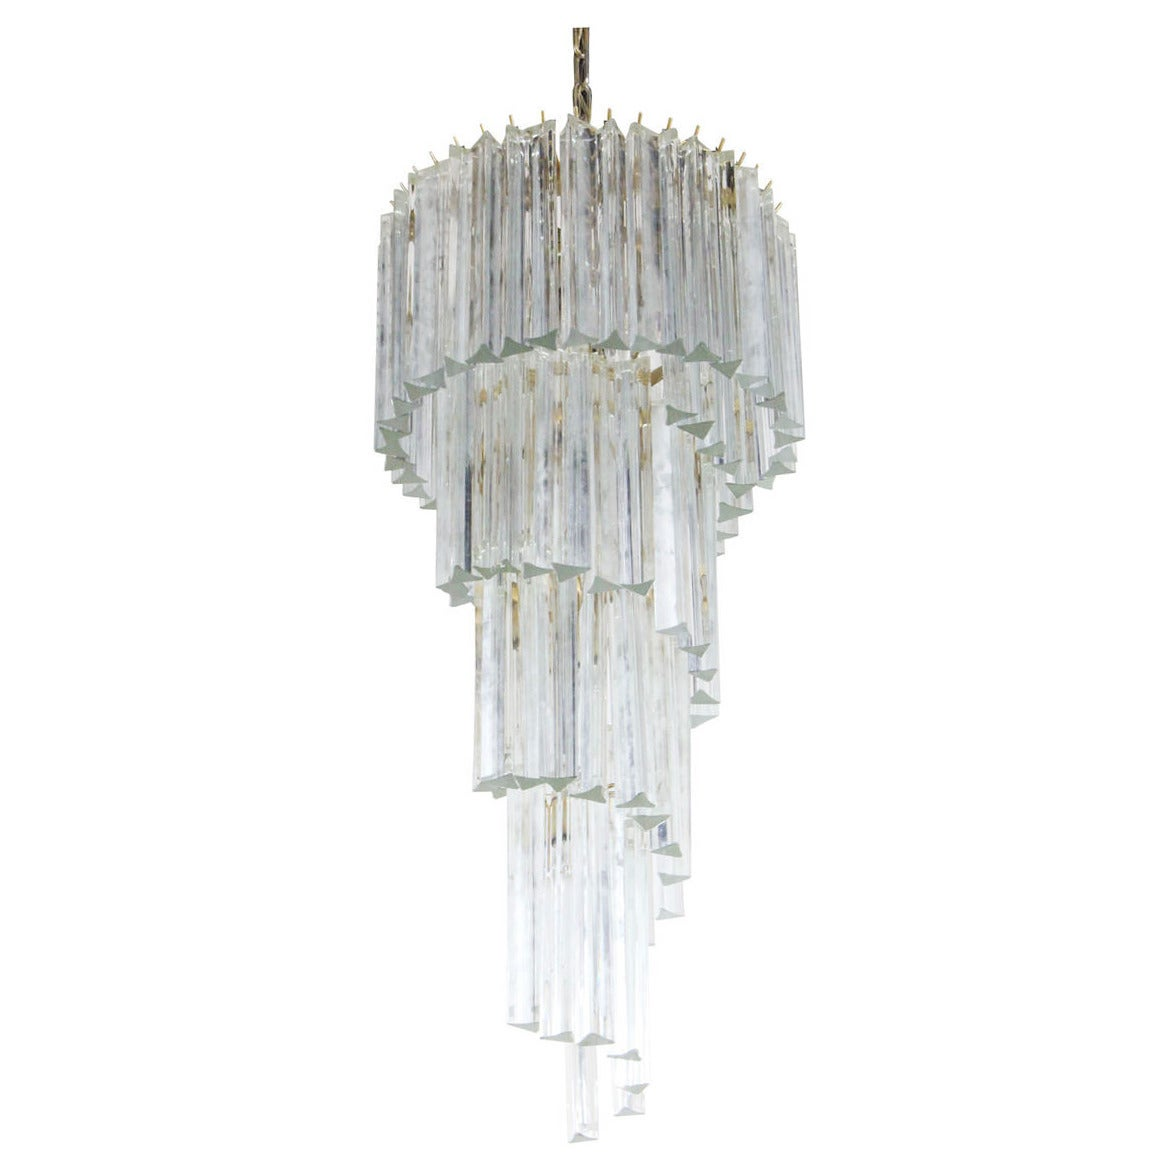 Spiral venini crystal chandelier at 1stdibs spiral venini crystal chandelier for sale aloadofball Images